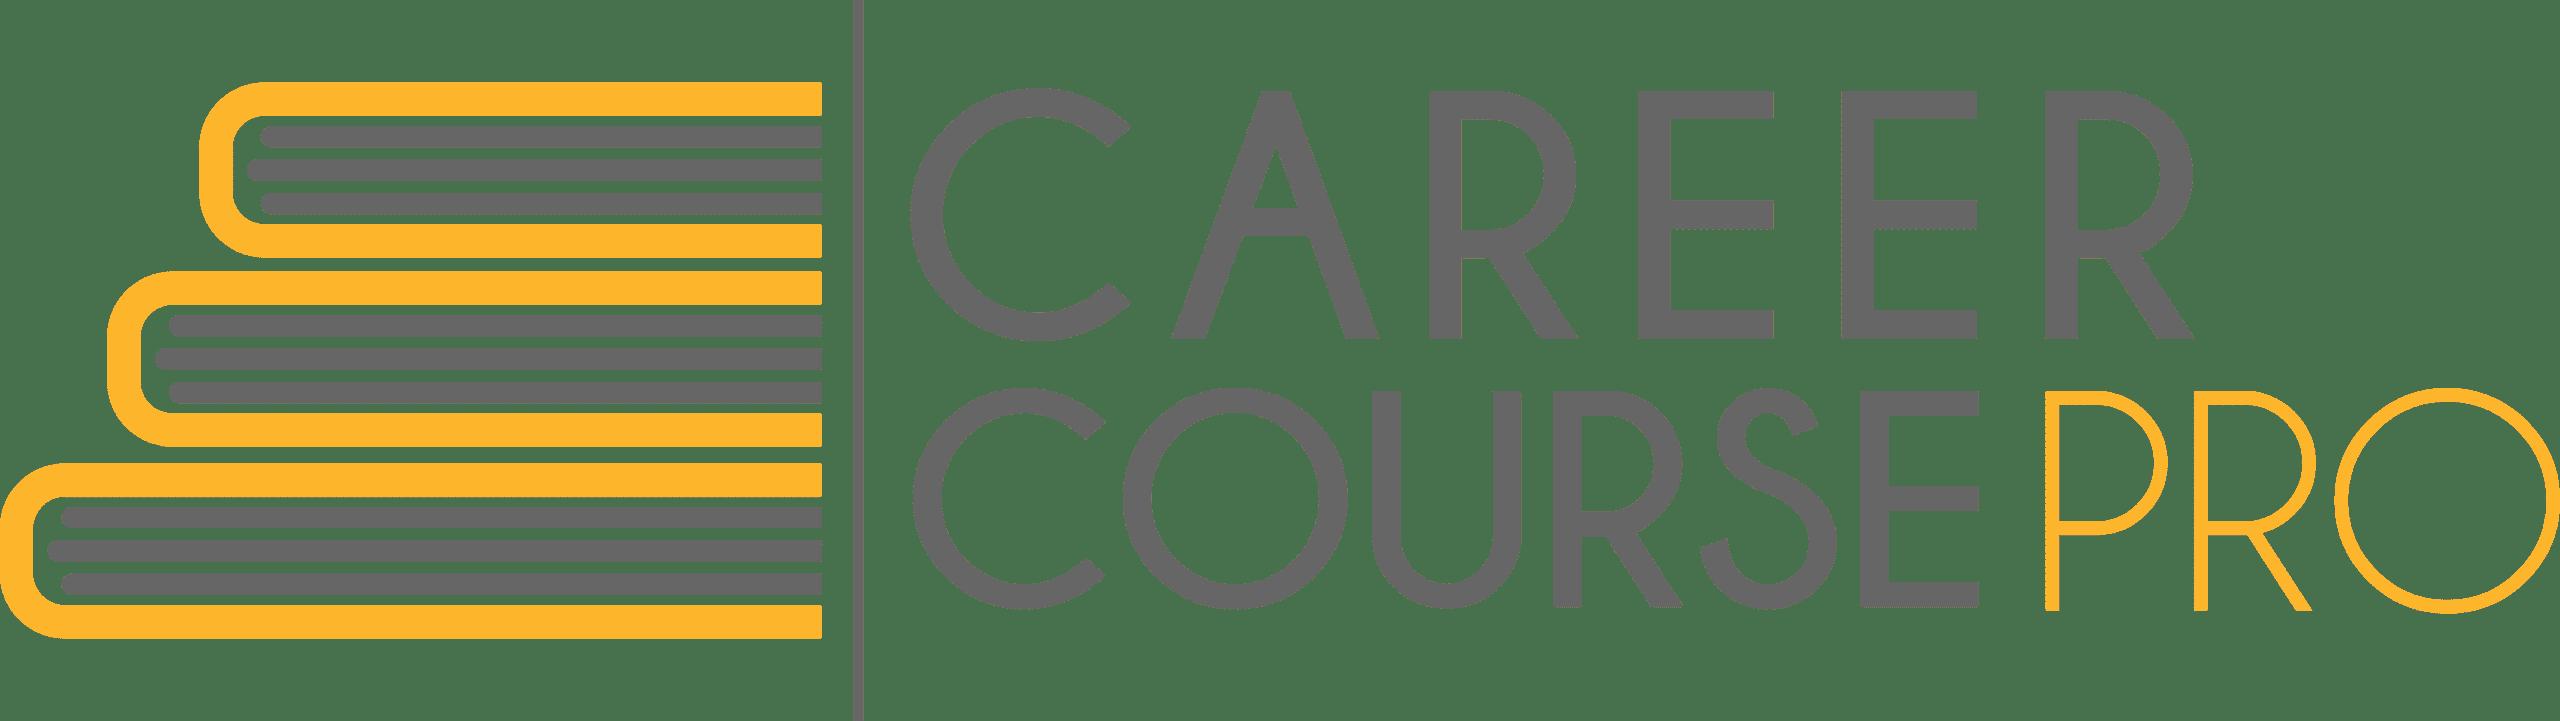 CareerCoursePro